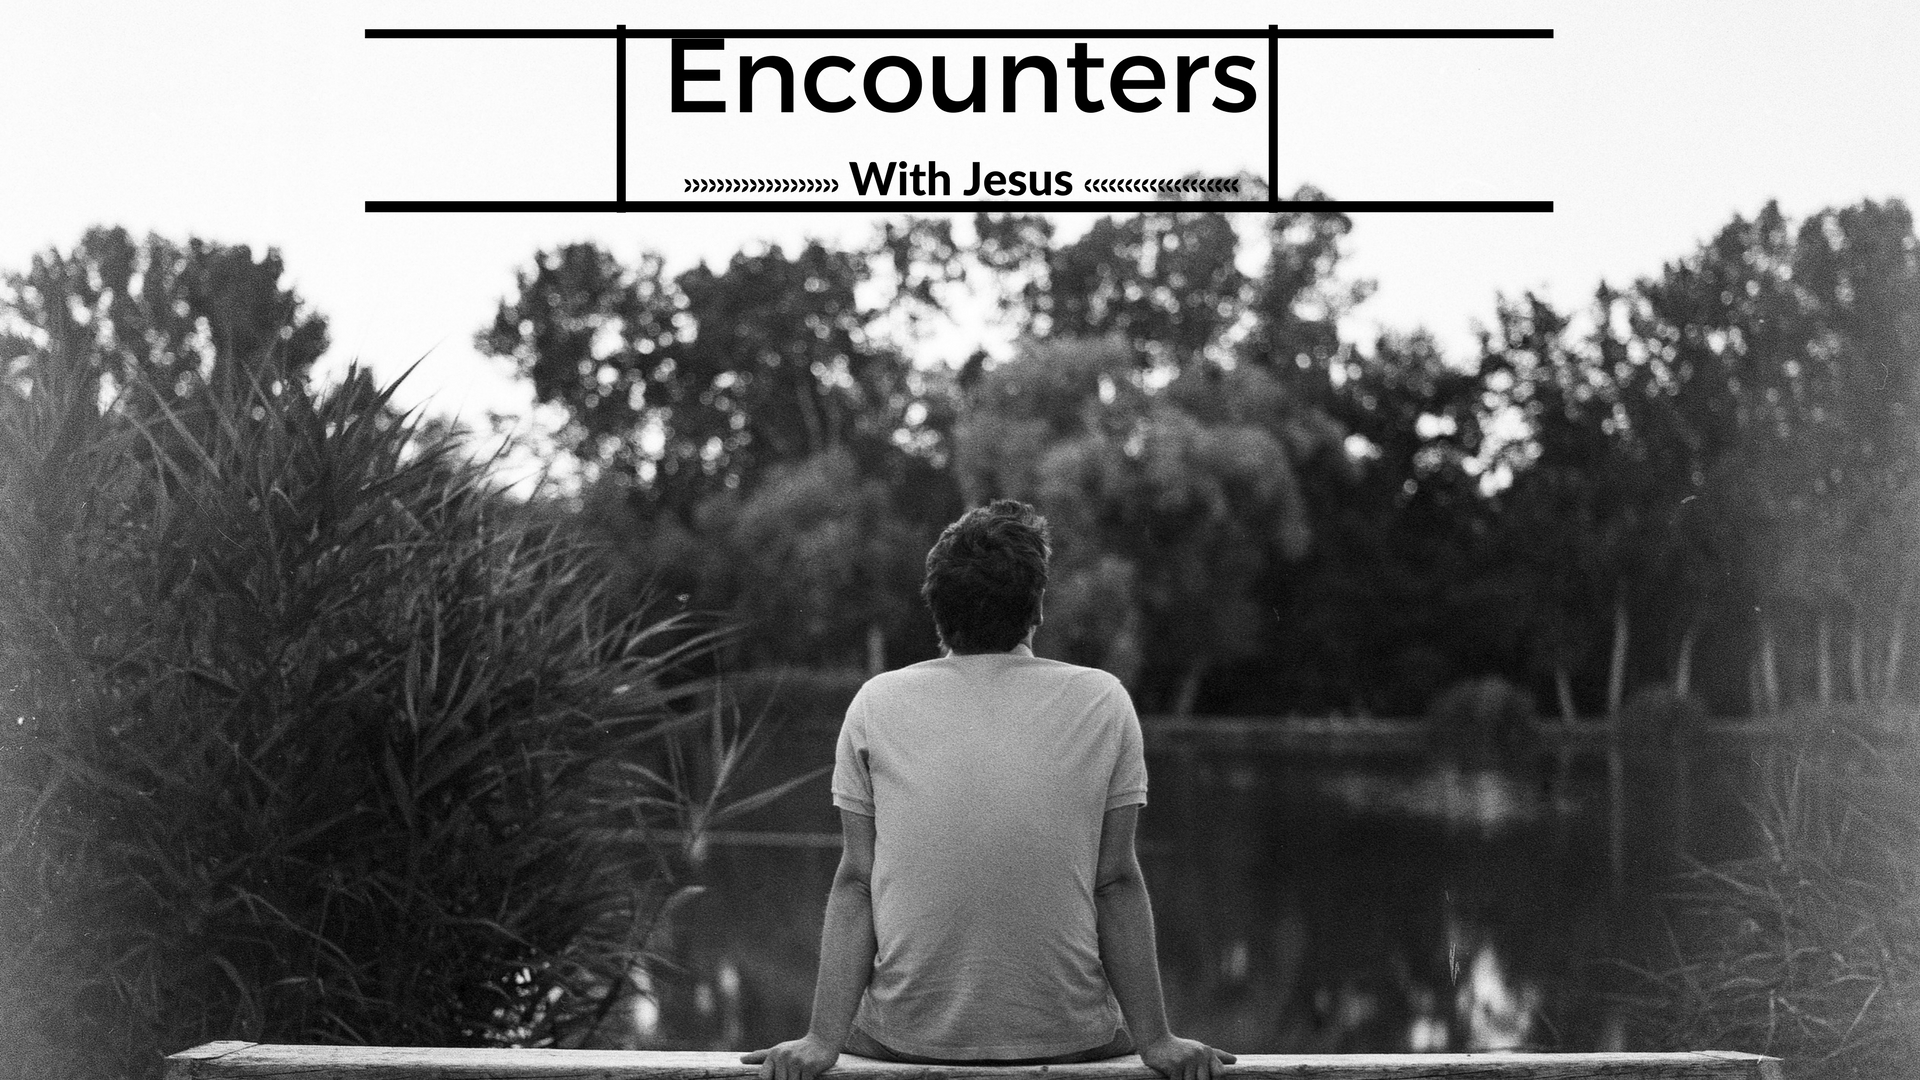 Encounters with Jesus 16_9.jpg